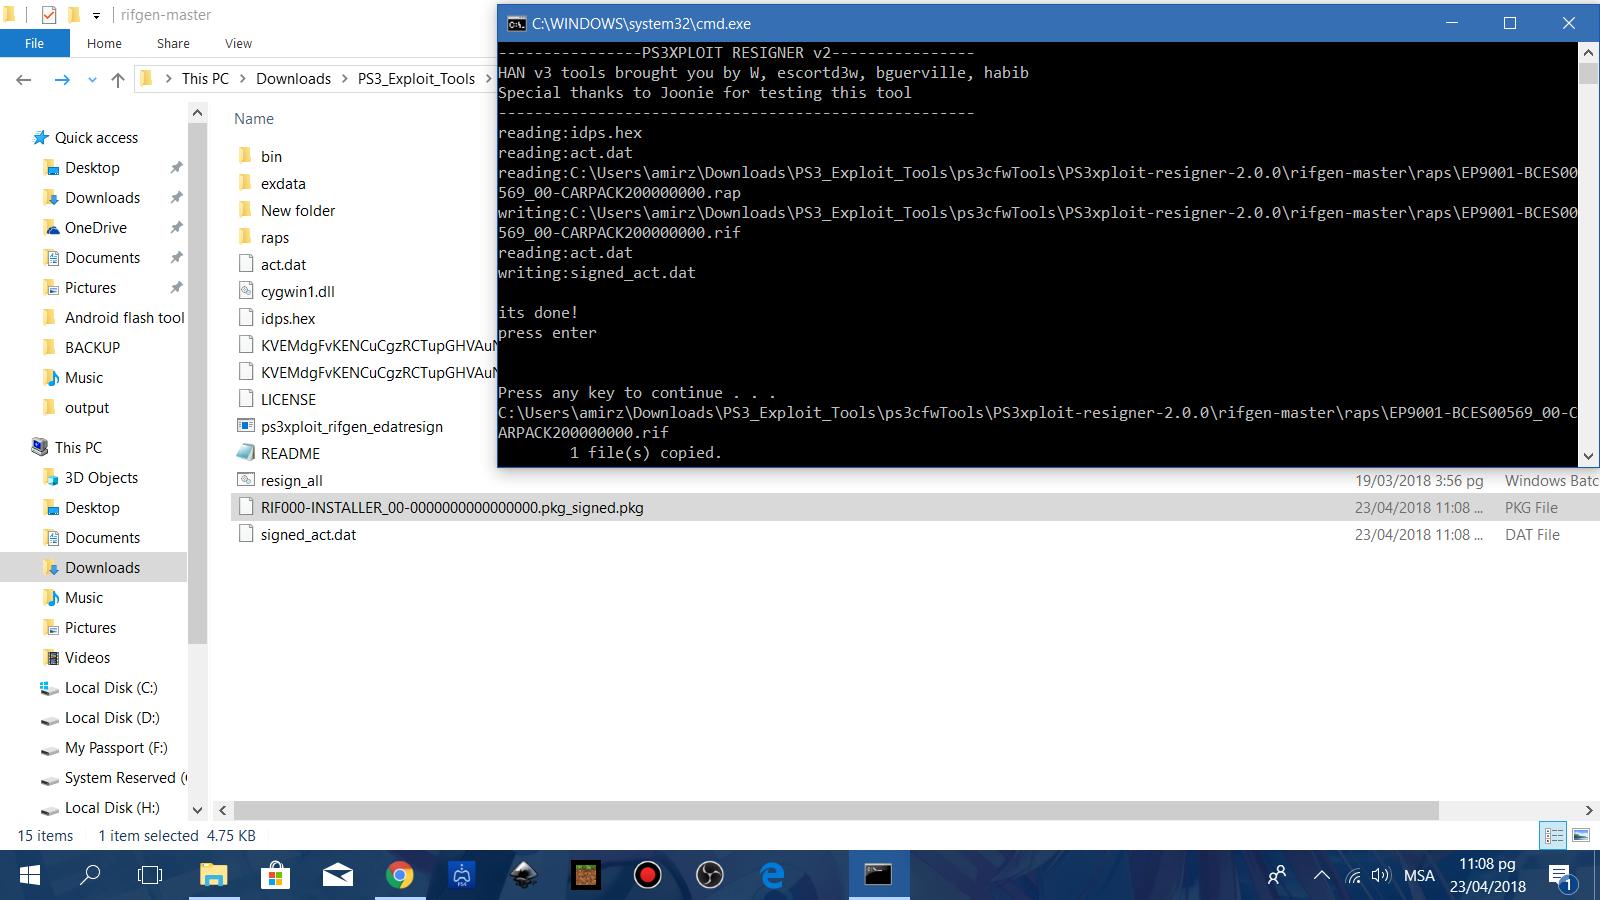 amirzaim@geek-droid:~$: [PS3Xploit Tutorial] How to Install